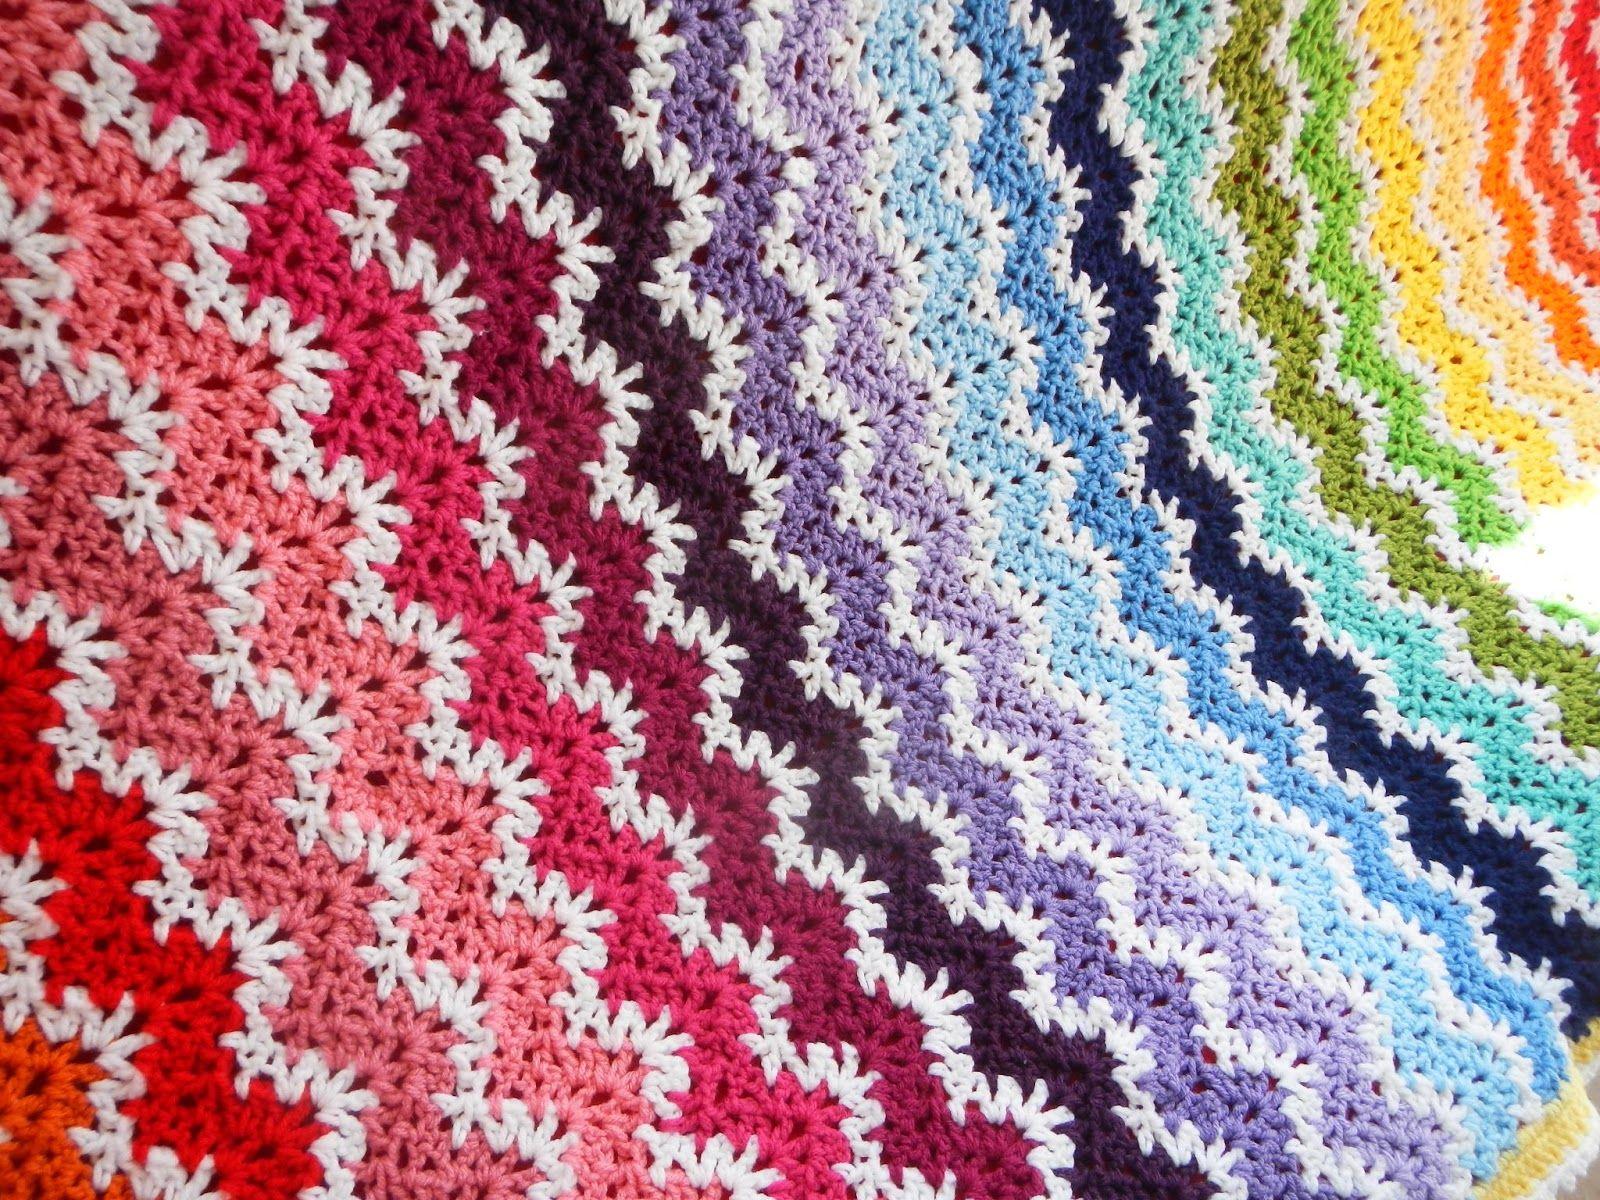 crochet churchmouse stitch   Apple Blossom Dreams: Stash-Buster #22 ...